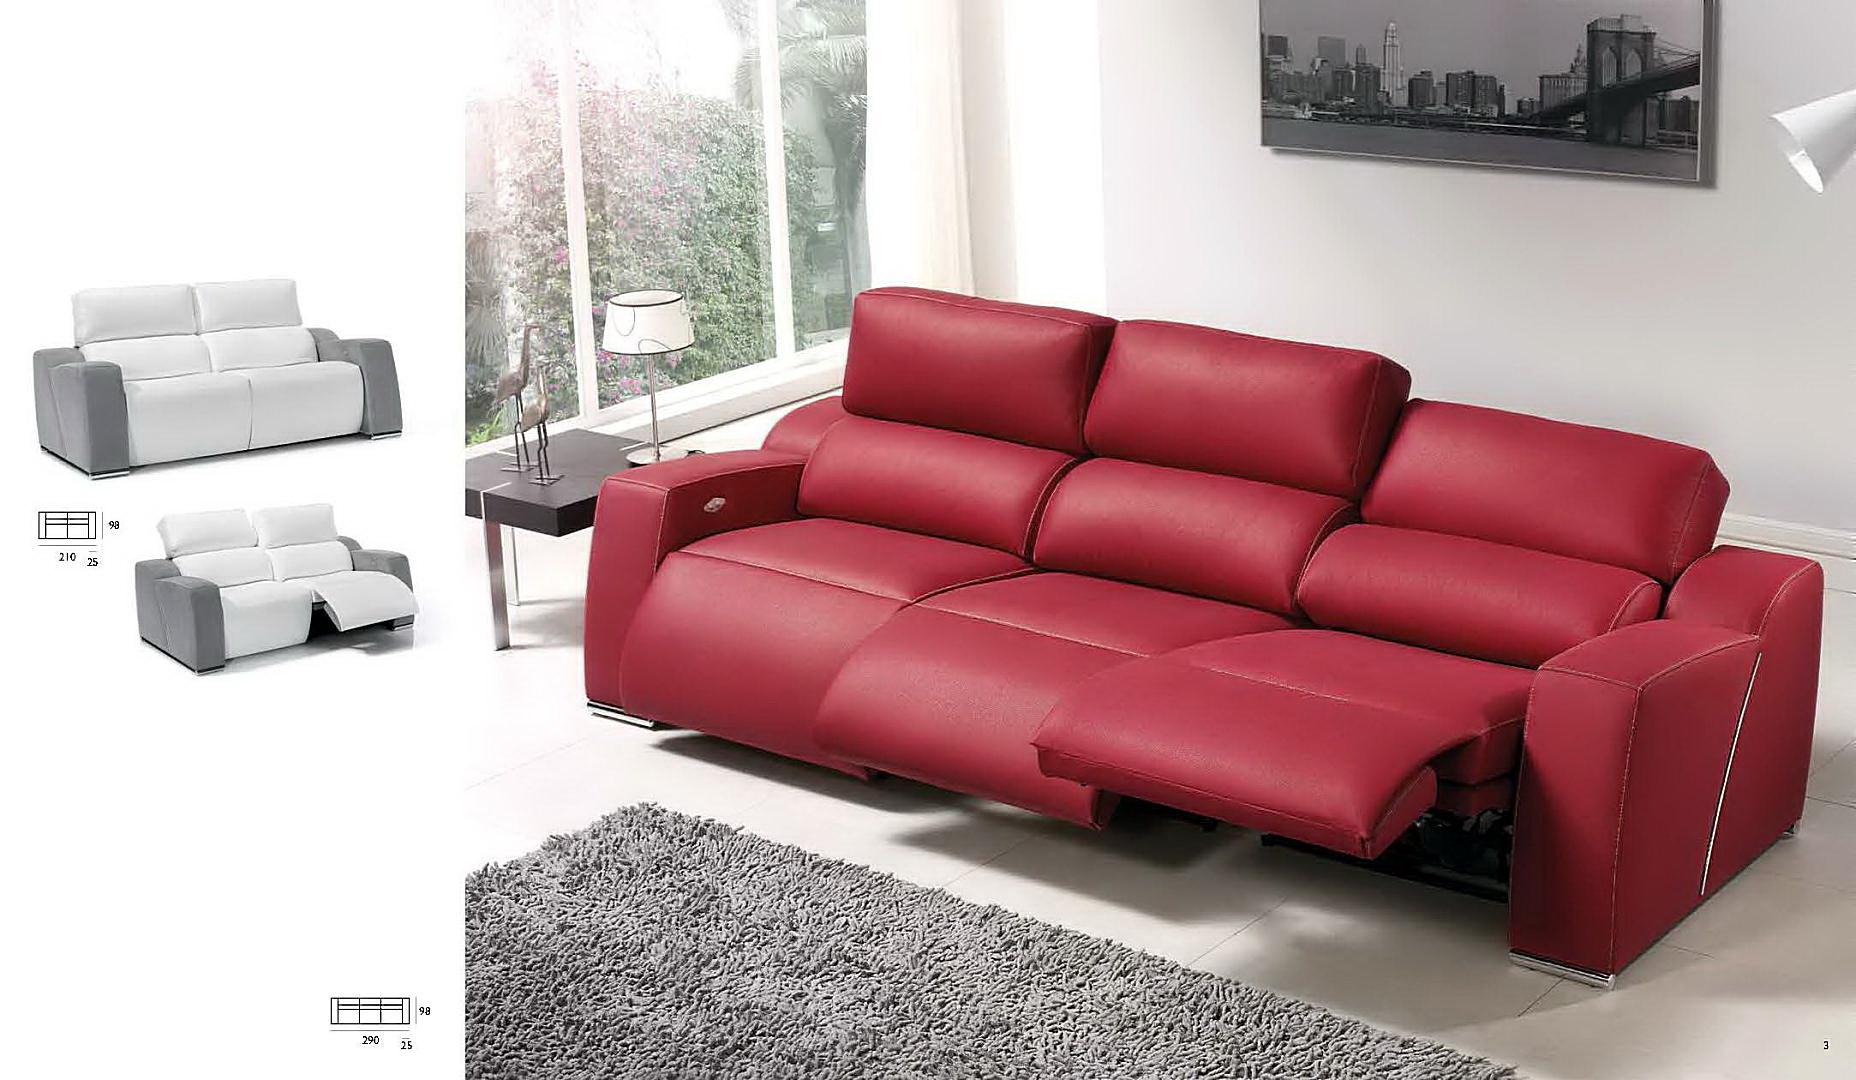 Oporto sof s modulares relax by verazzo design muebles for Muebles en leon baratos